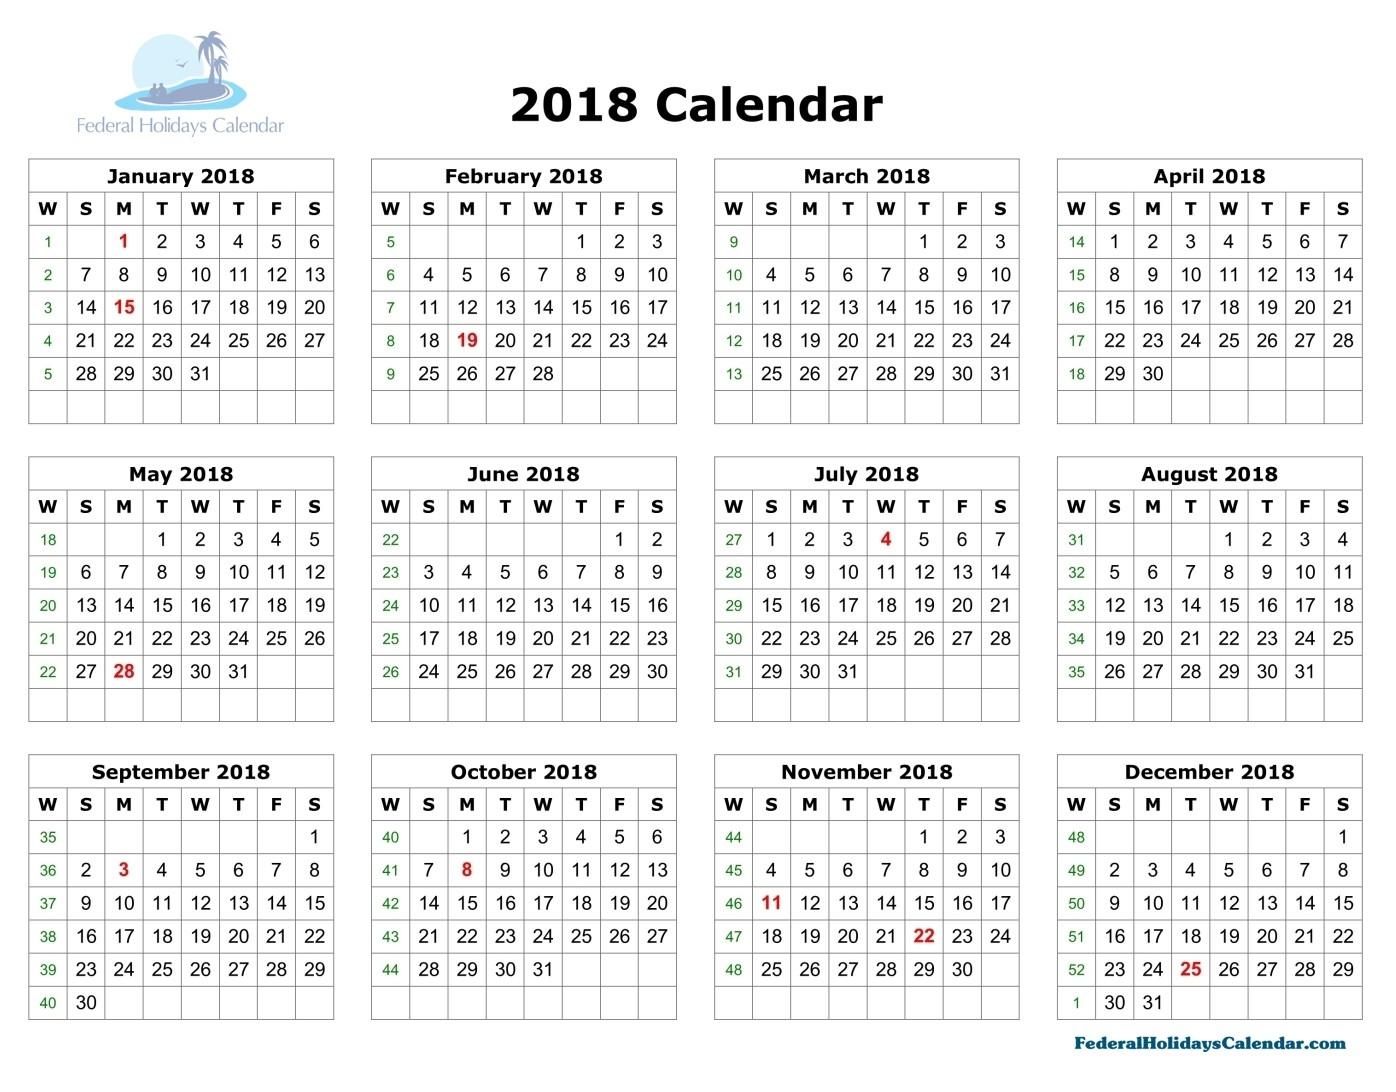 october 2018 calendar holidays usa printable calendar 2018 holiday 2018 Calendar With Holidays Usa Printable erdferdf